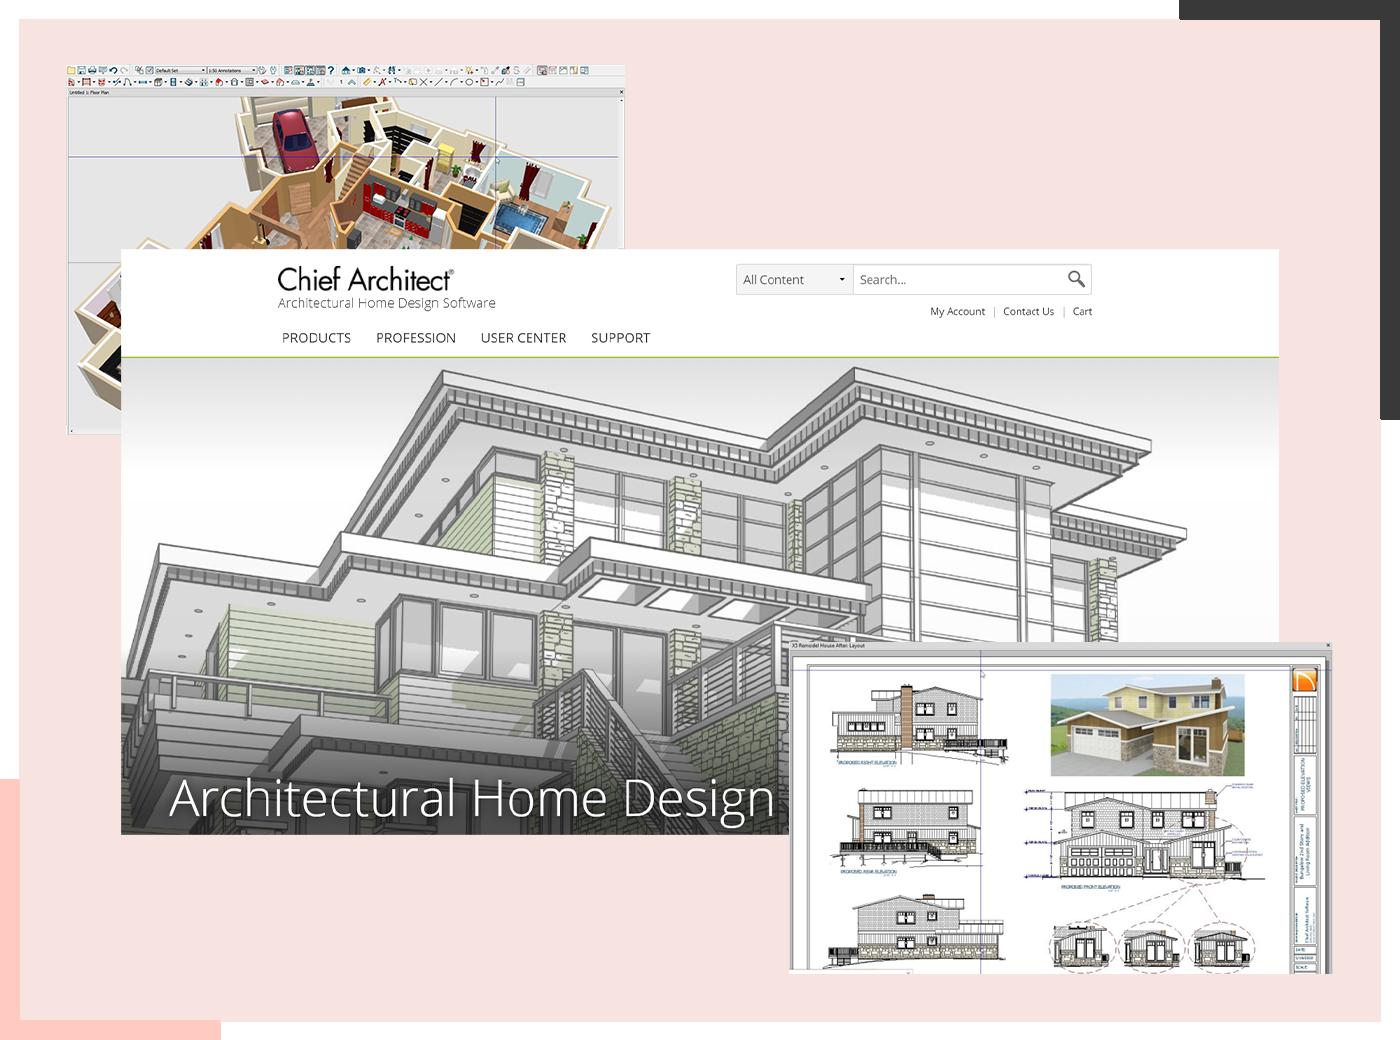 Cheif Architect